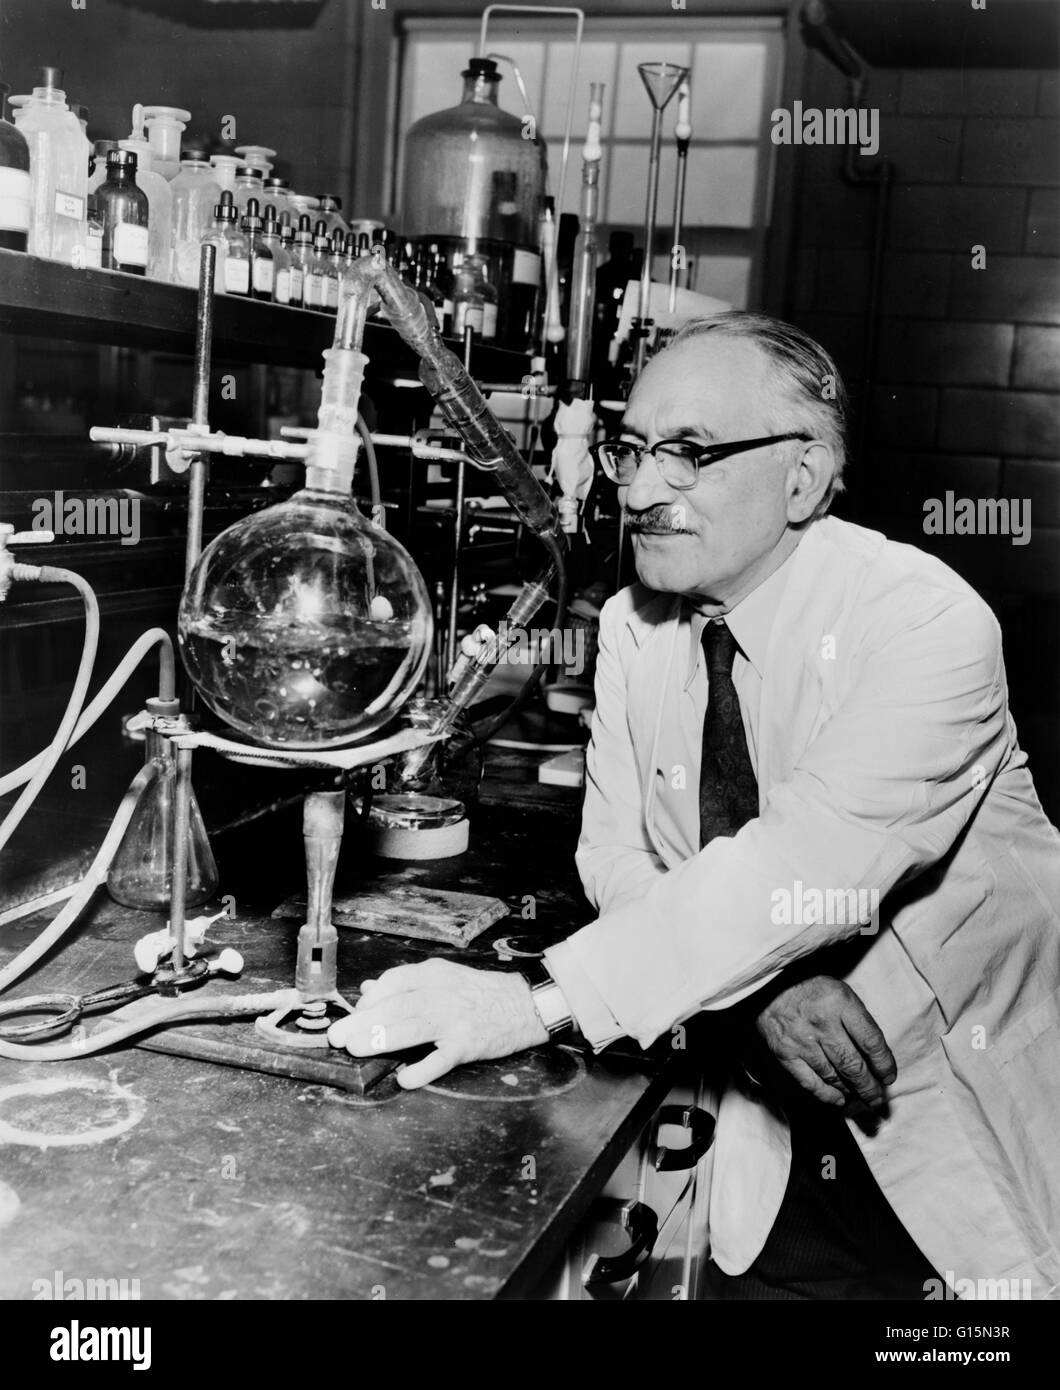 Selman Abraham Waksman (July 22, 1888 - August 16, 1973) was a Ukrainian-American biochemist and microbiologist - Stock Image